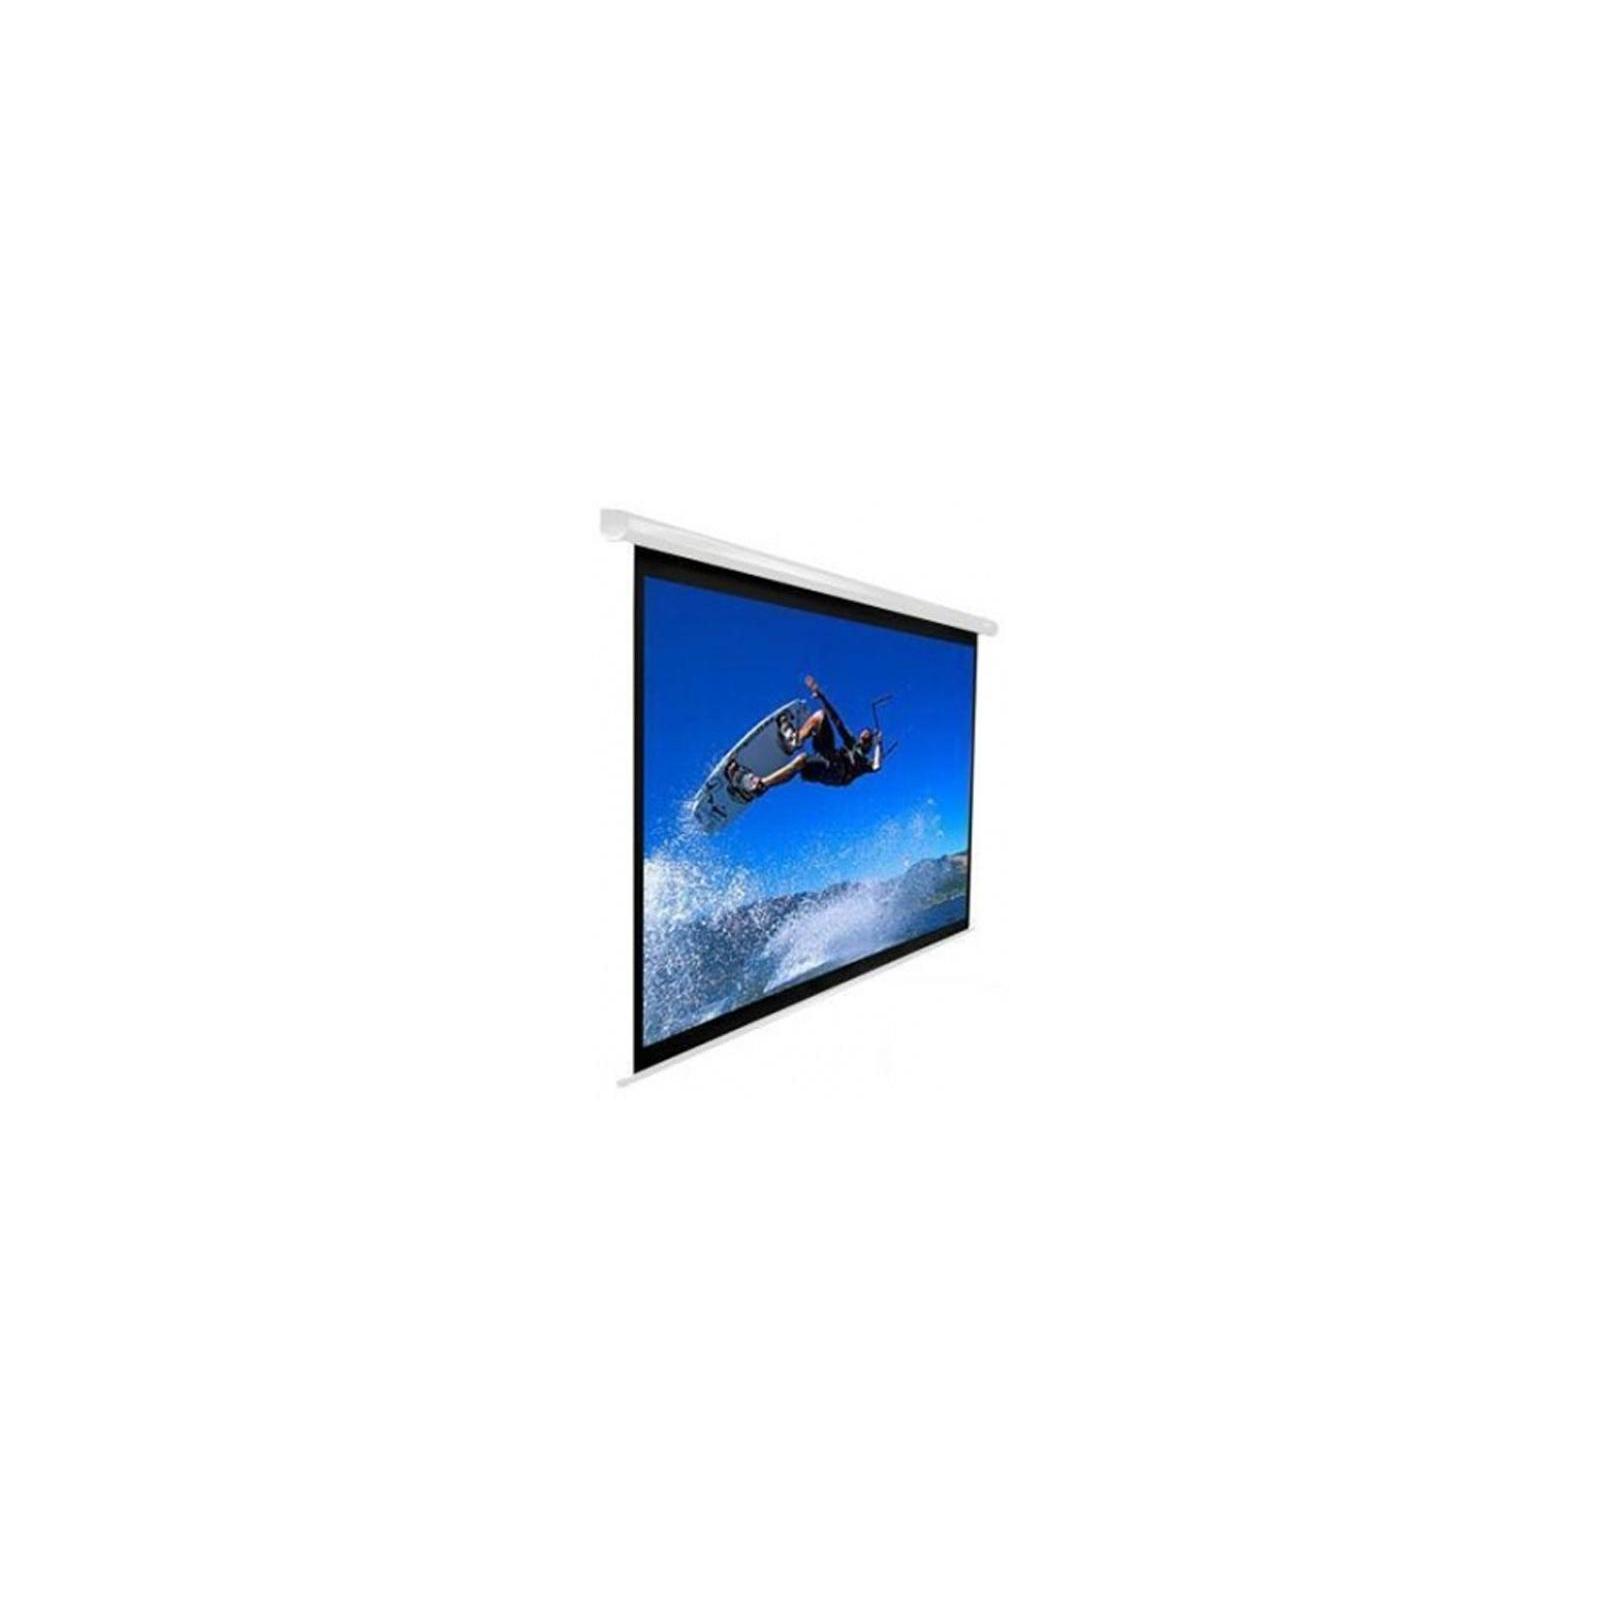 Проекционный экран VMAX135XWV2 ELITE SCREENS